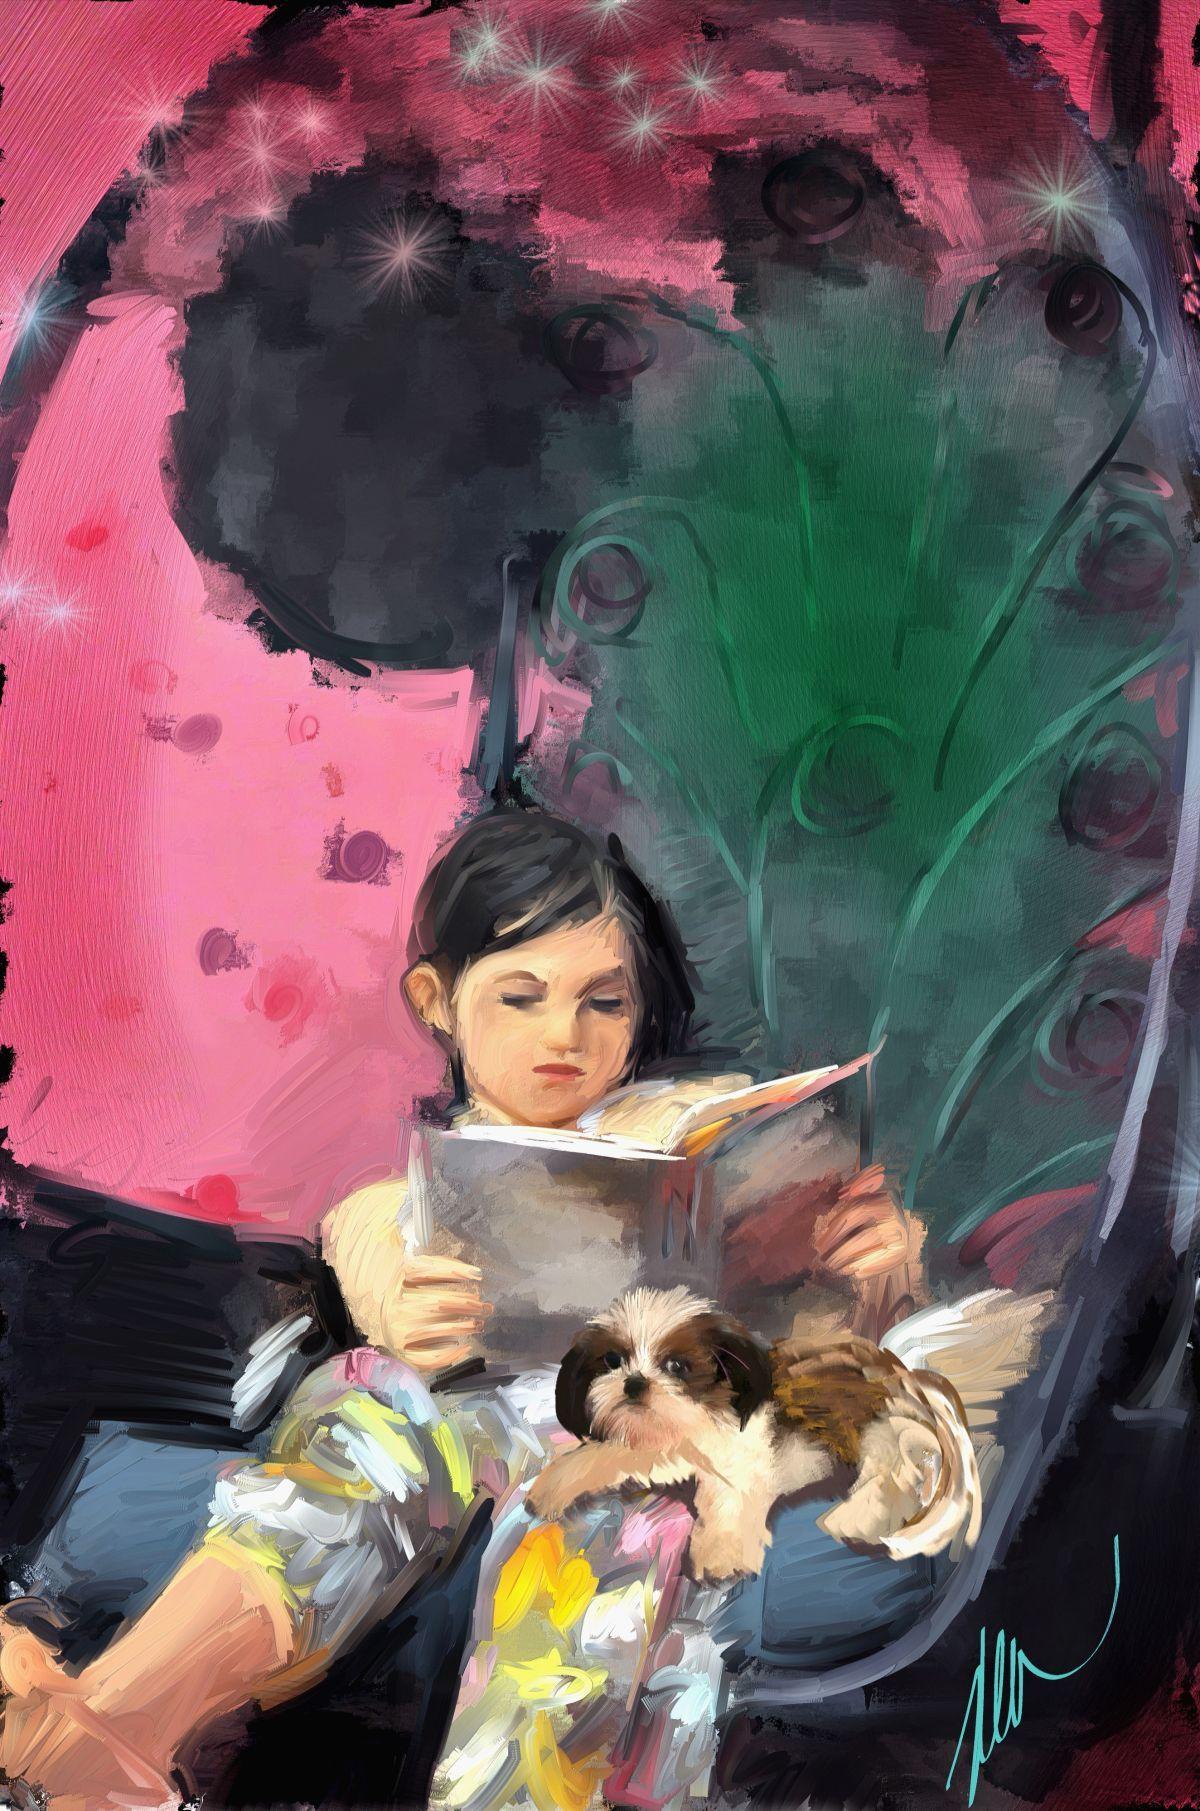 http://www.thesunthemoonthestarsandmaya.com/2013/09/reading-dr-seuss/ The more you read..... Dr. Seuss  #shih tzu #puppies #books #spiritual